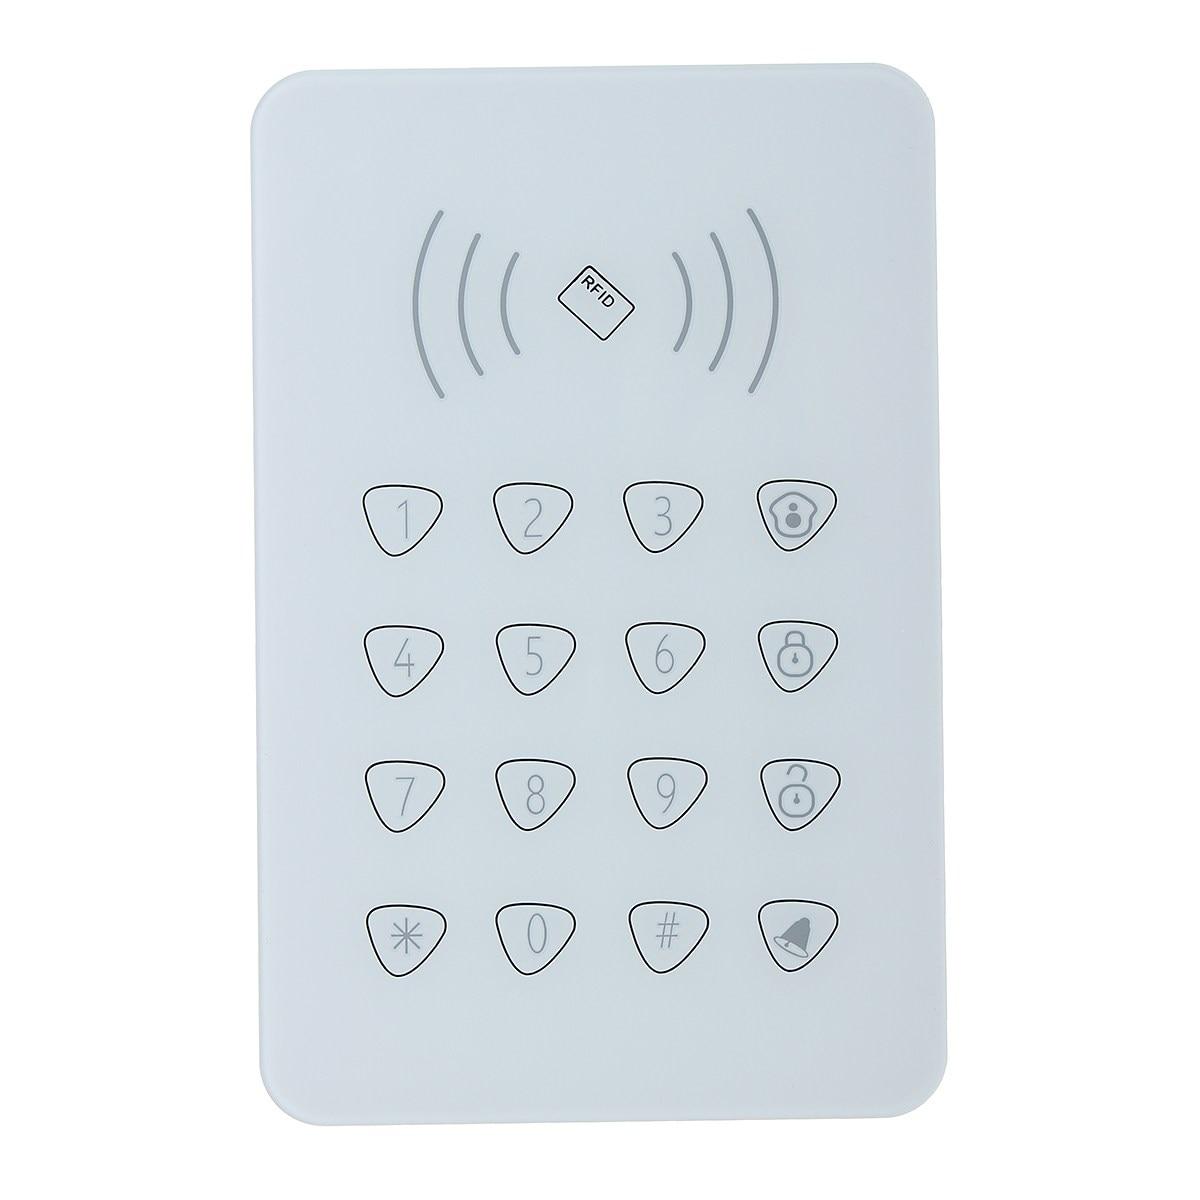 NEW Wireless Touch Keypad  Alarm Sensors Accessories G90B For WiFi GSM Home Intruder Security Alarm Mainframe Kits wireless smoke fire detector for wireless for touch keypad panel wifi gsm home security burglar voice alarm system